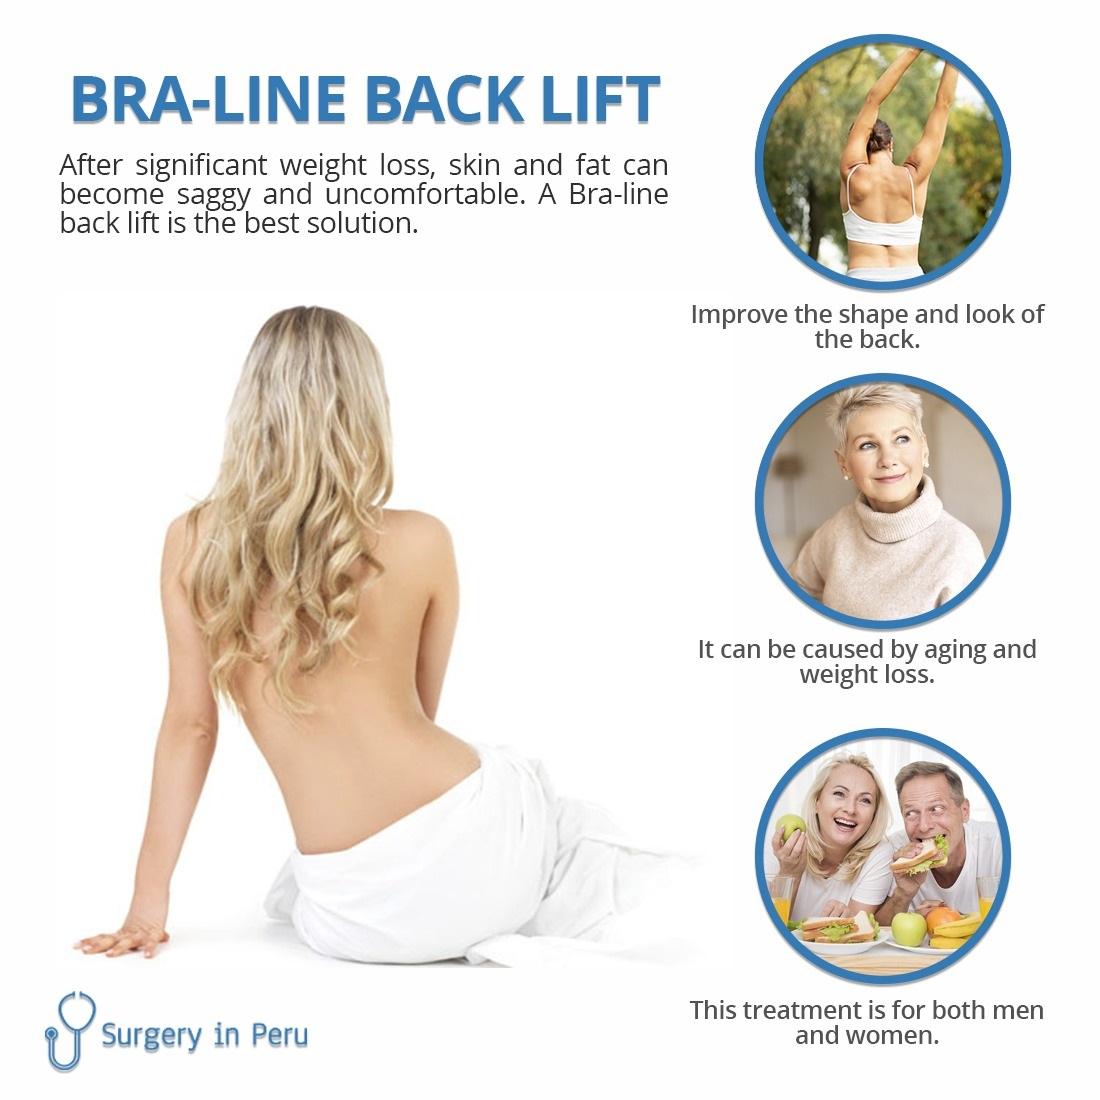 bra line back lift